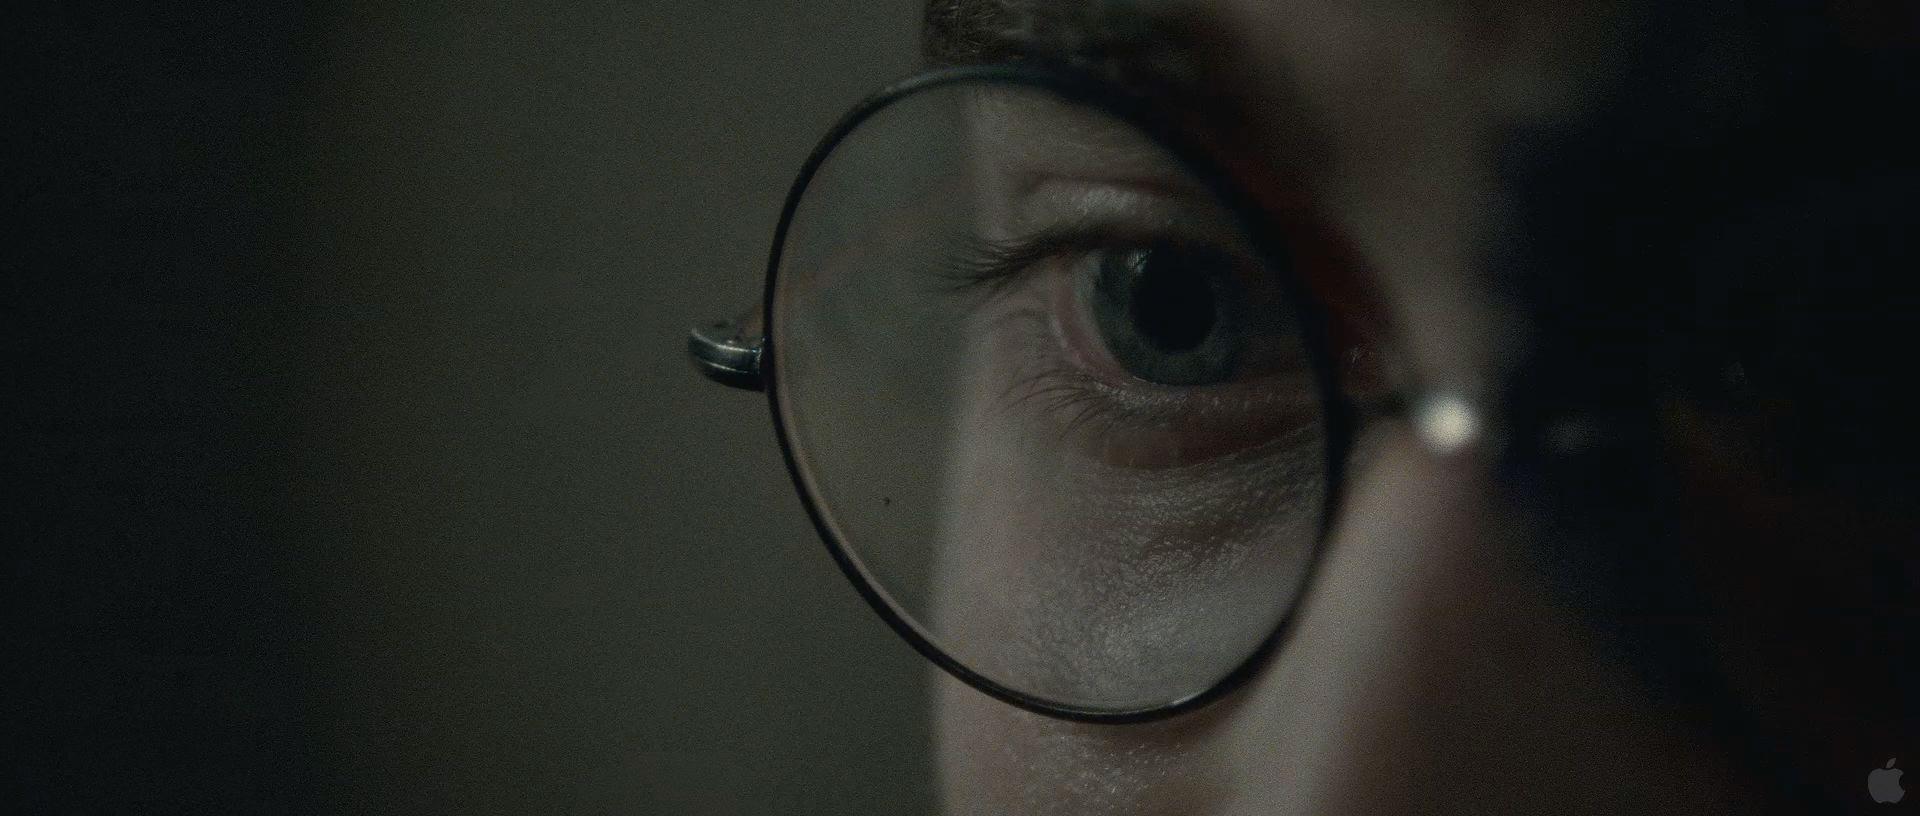 Harry Potter BlogHogwarts HP7 2 Trailer 08